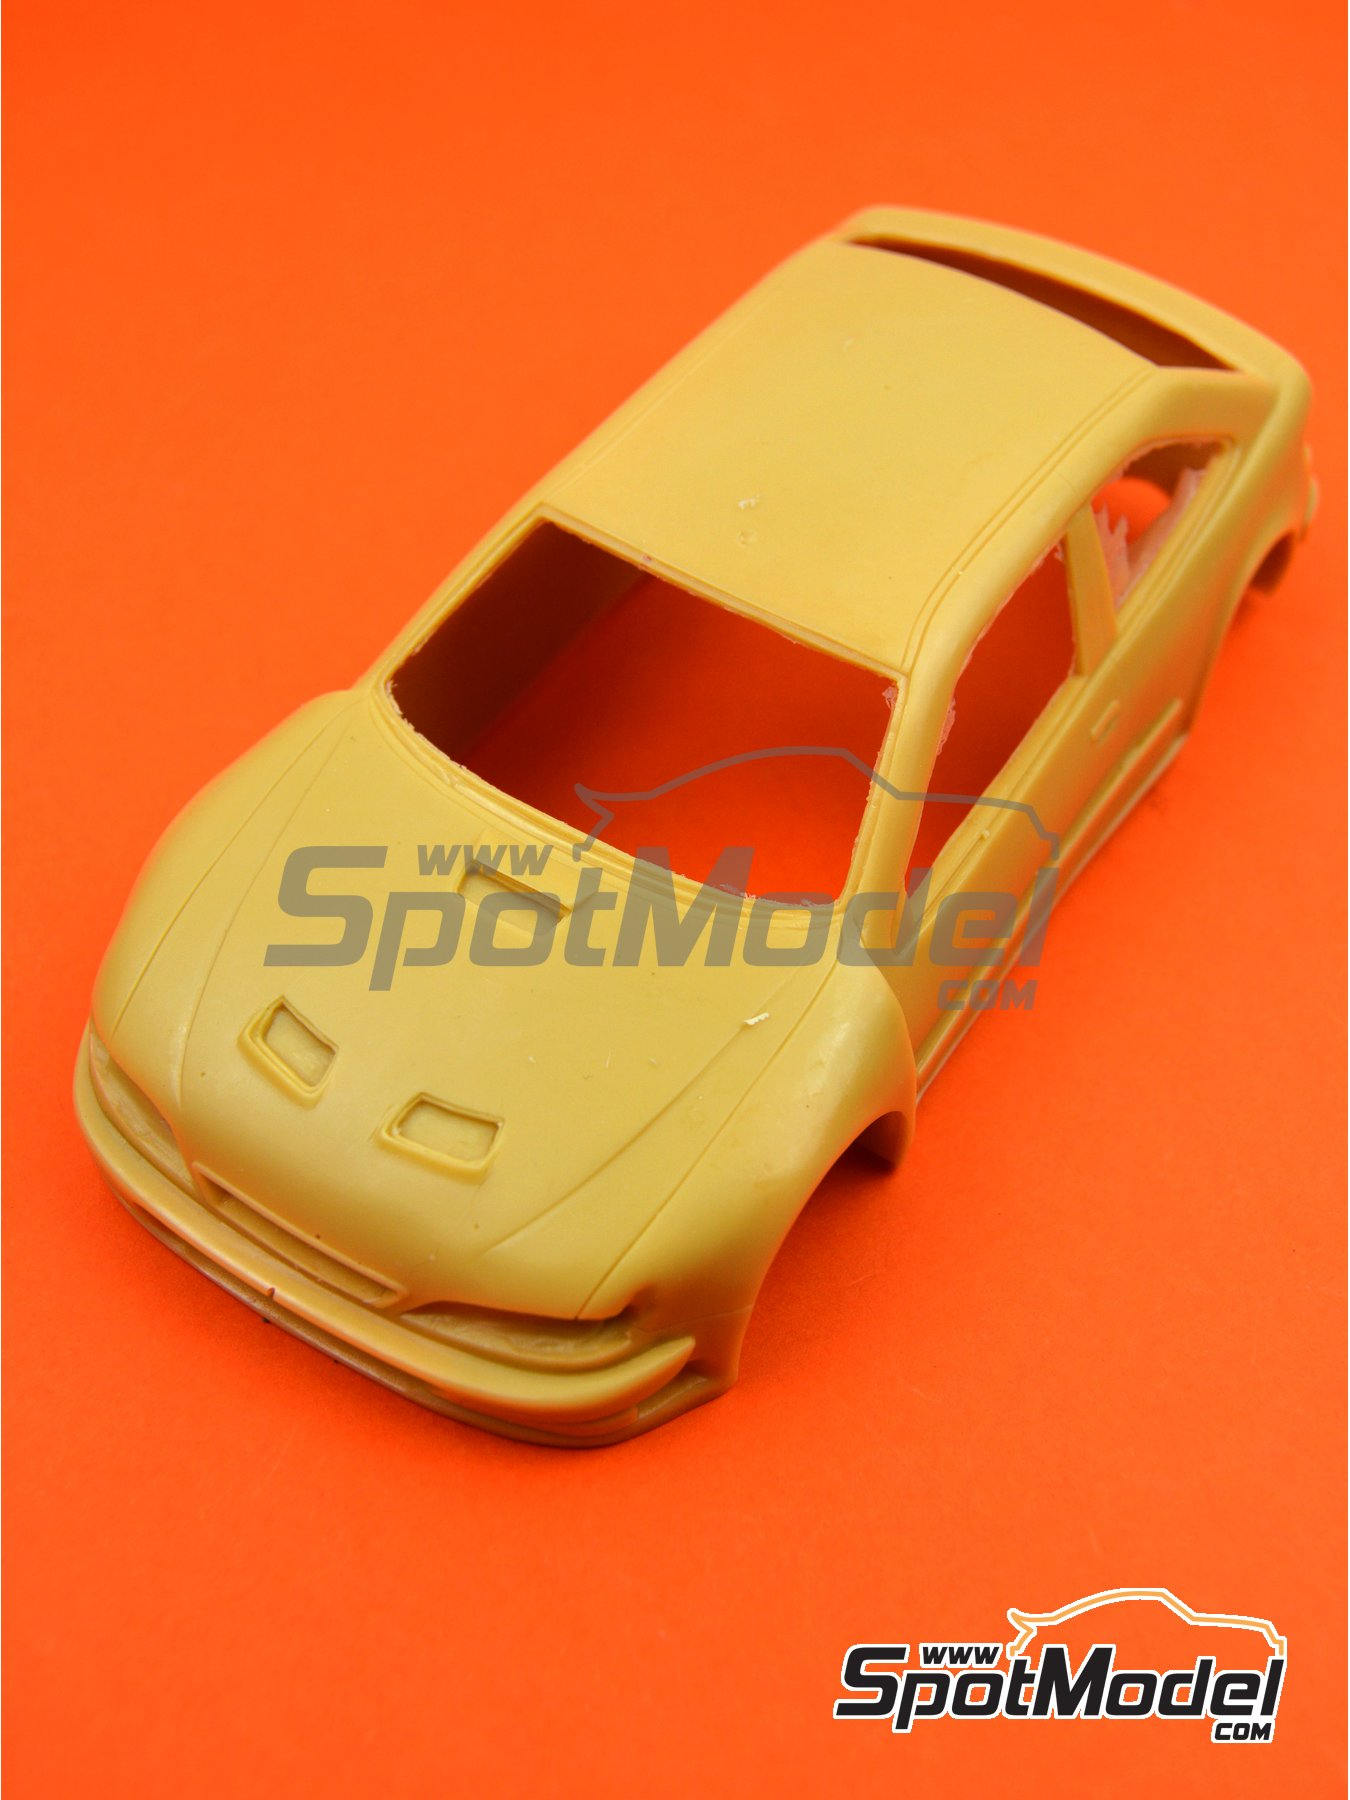 Citroen Xsara T4 WRC | Bodywork in 1/24 scale manufactured by Renaissance Models (ref.CTR2409-BODY) image